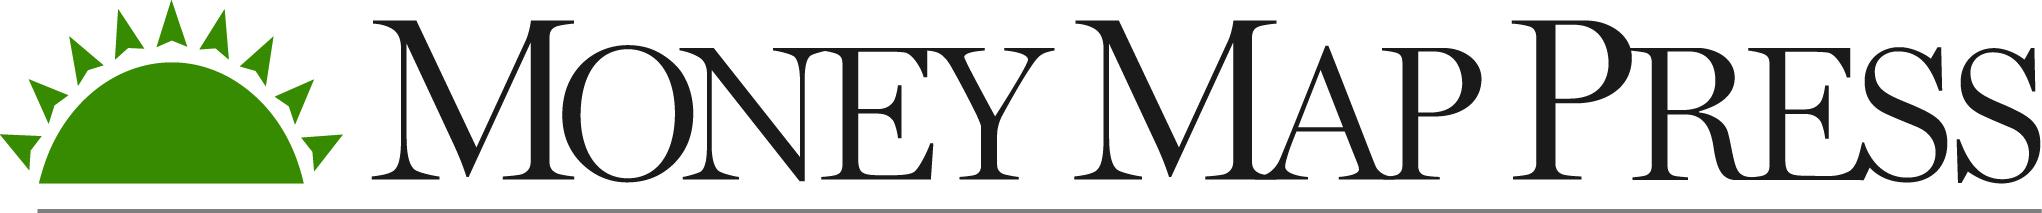 Money Map Press Associate Editor Job in Baltimore, MD at Money Map Press Money Map Press